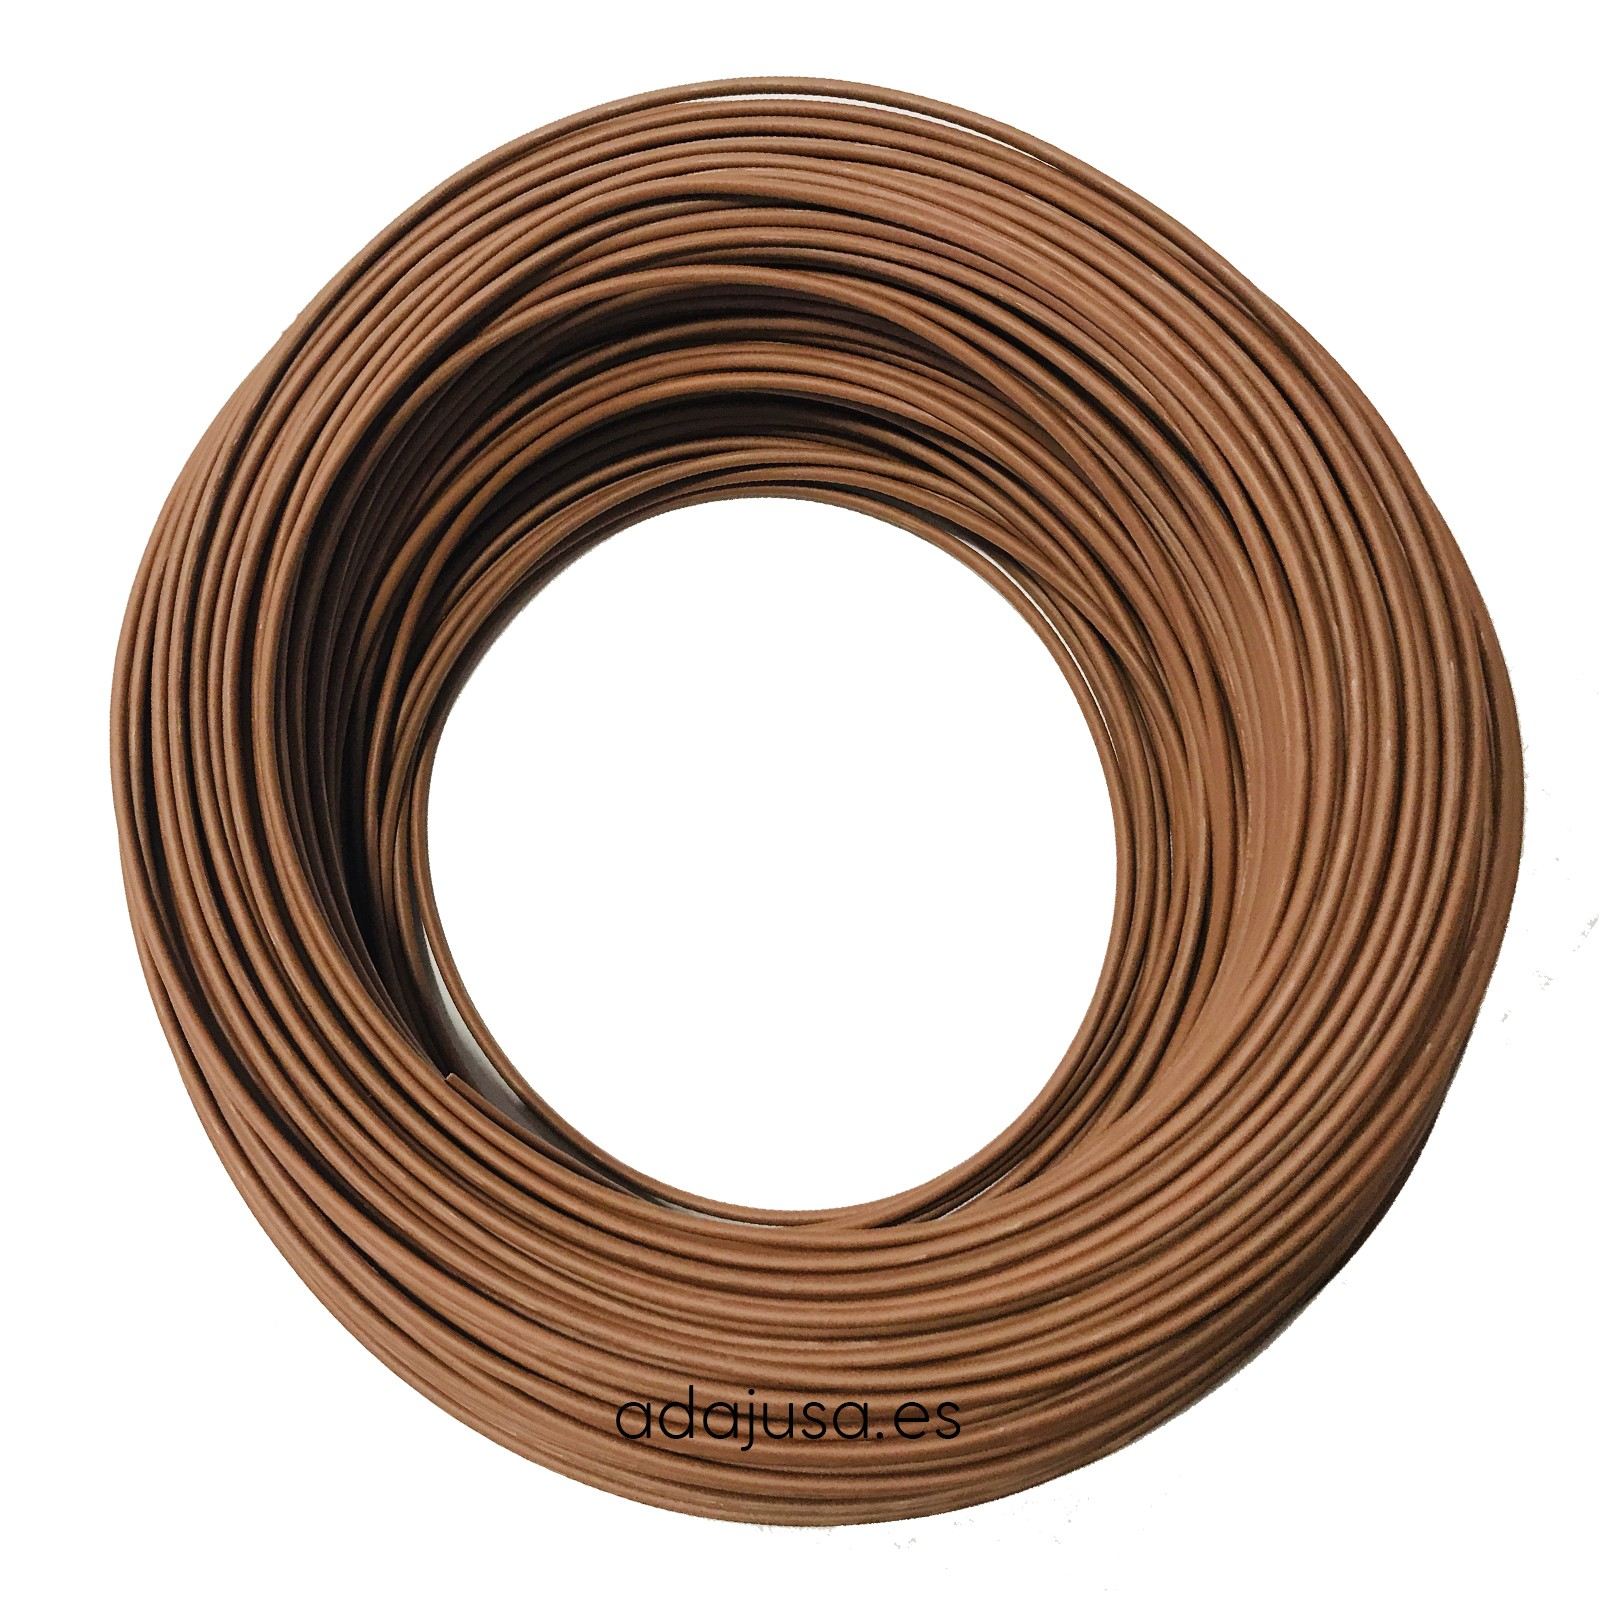 Flexible cable 4 mm2 unipolar brown color